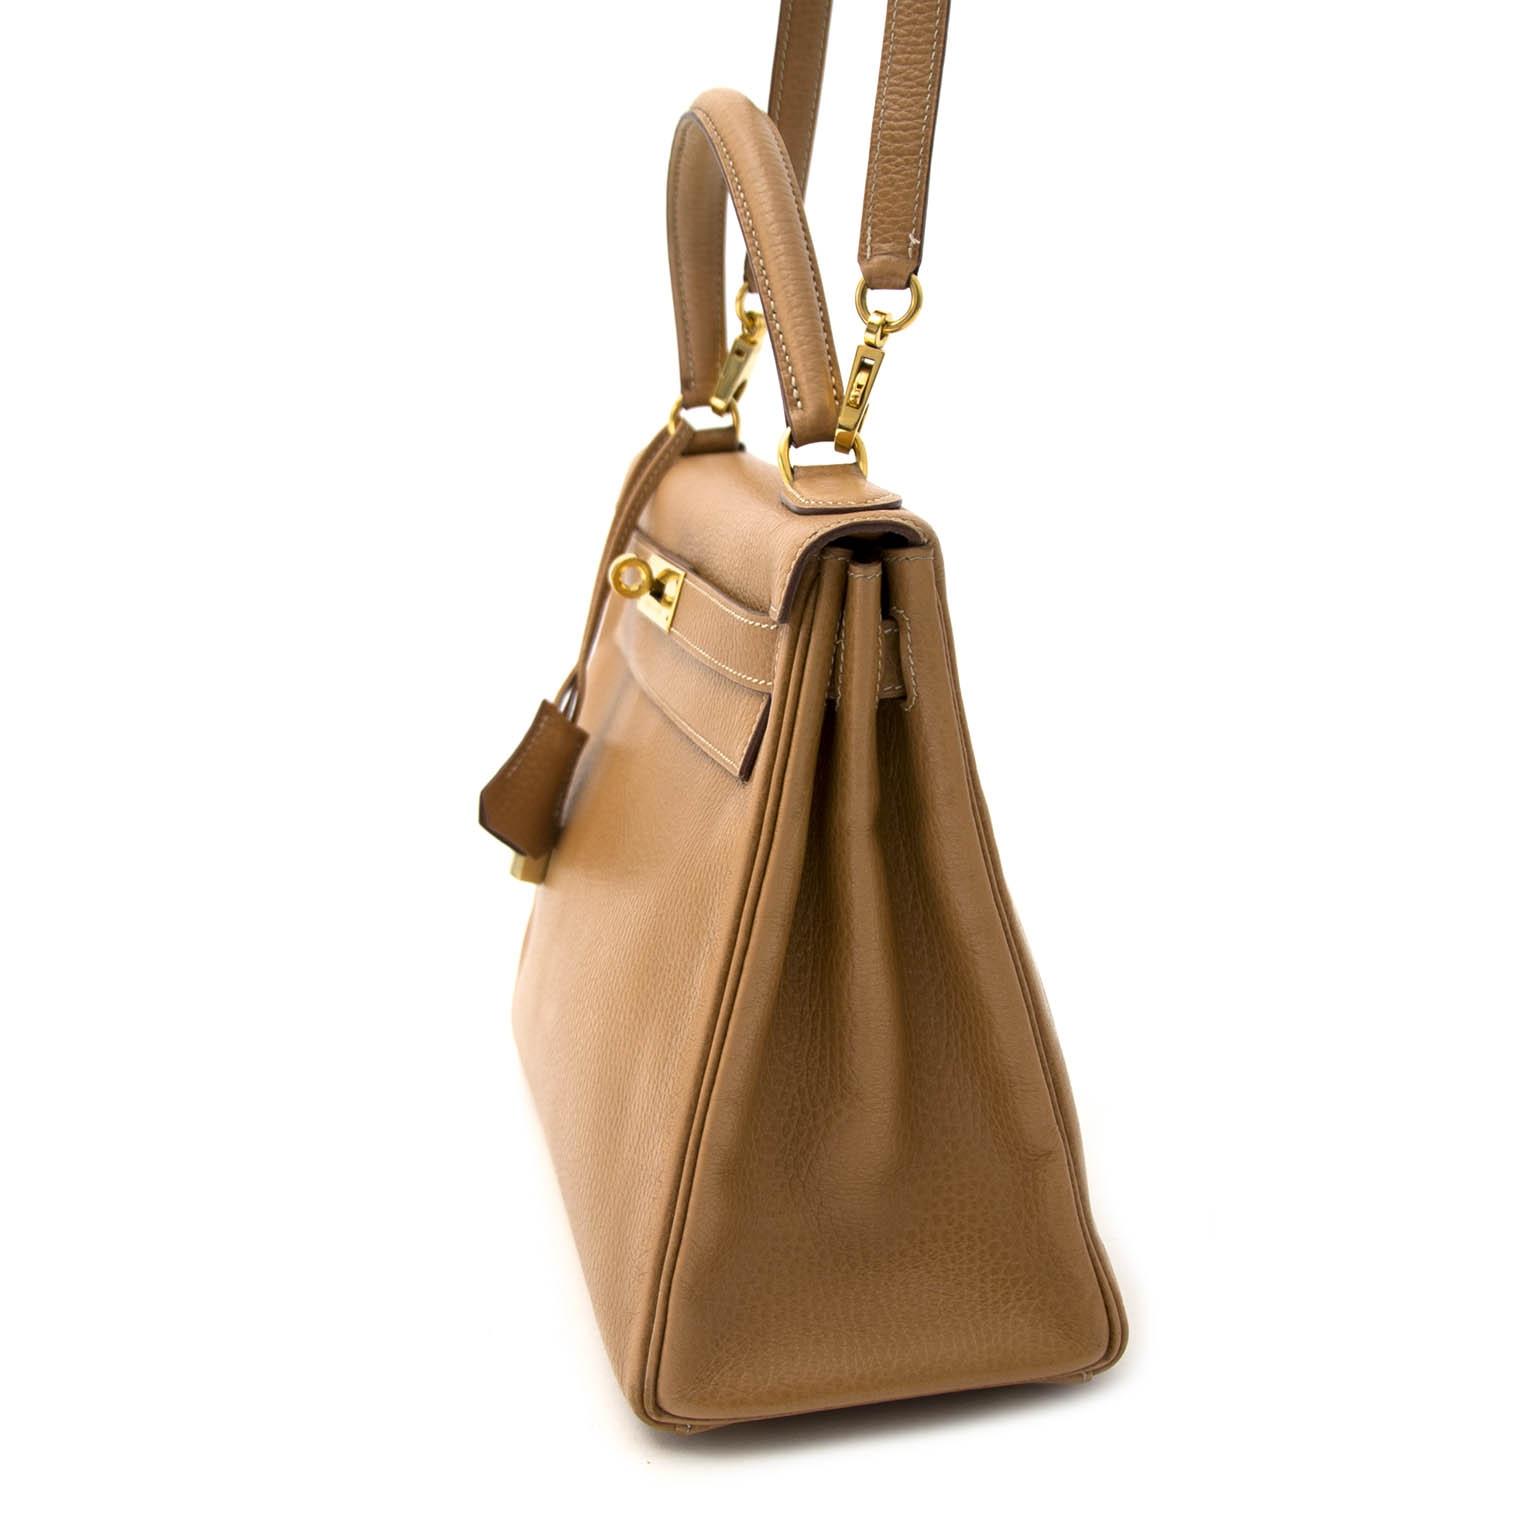 e27ada8cad05 ... acheter en ligne seconde main Hermès Caramel Kelly 28 Fache Liegee GHW